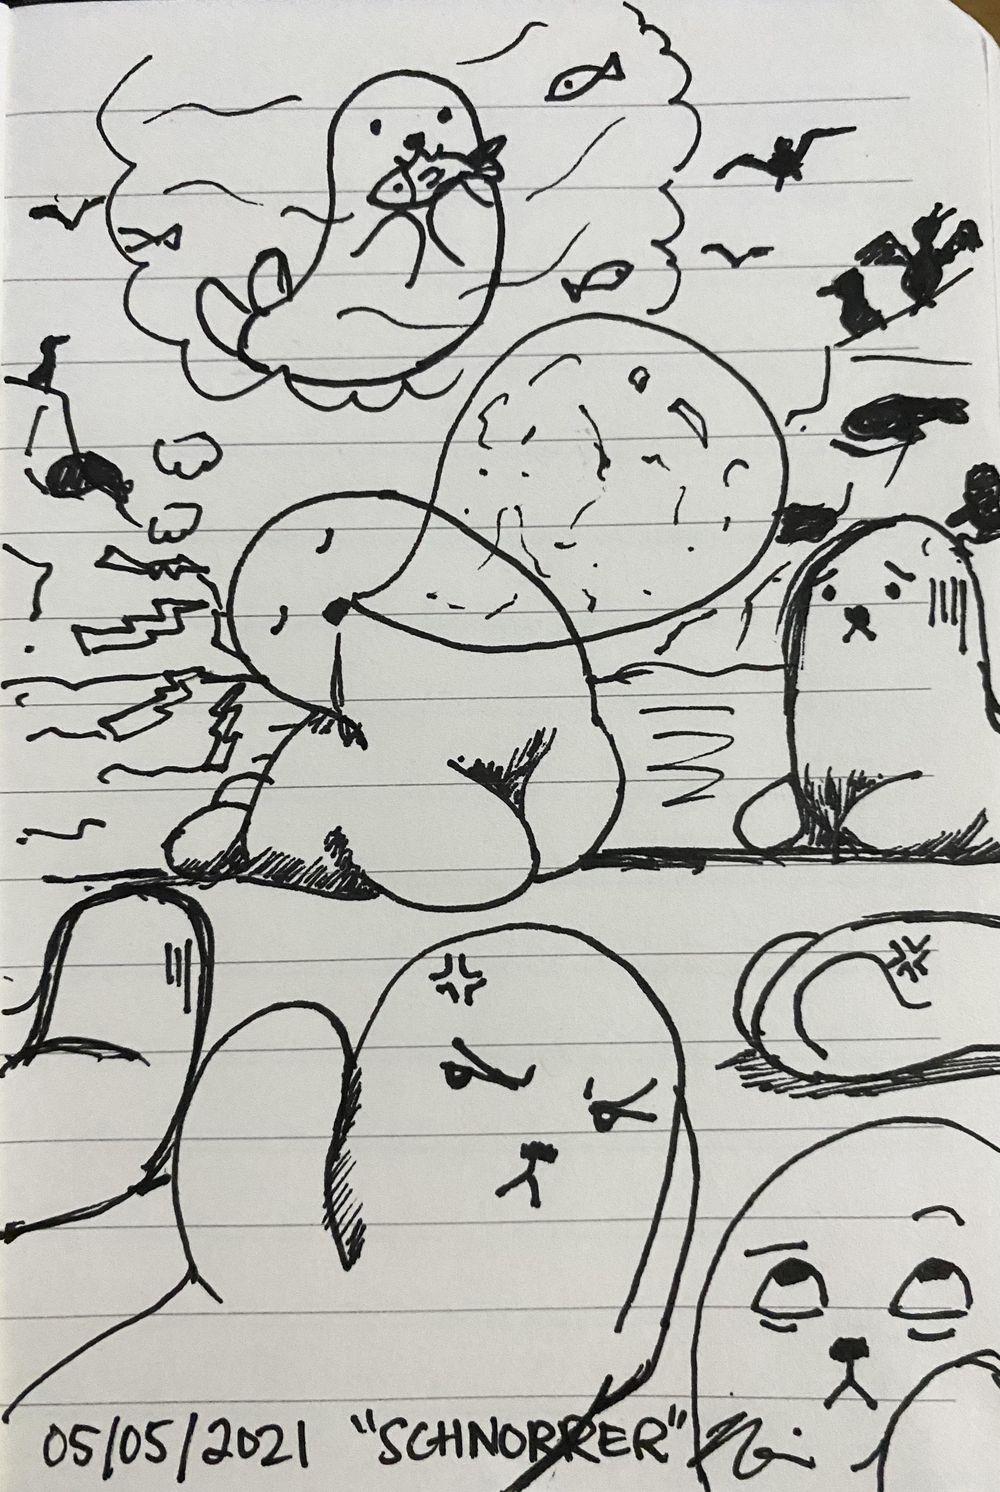 Nerissa's Random Word Doodles - image 2 - student project